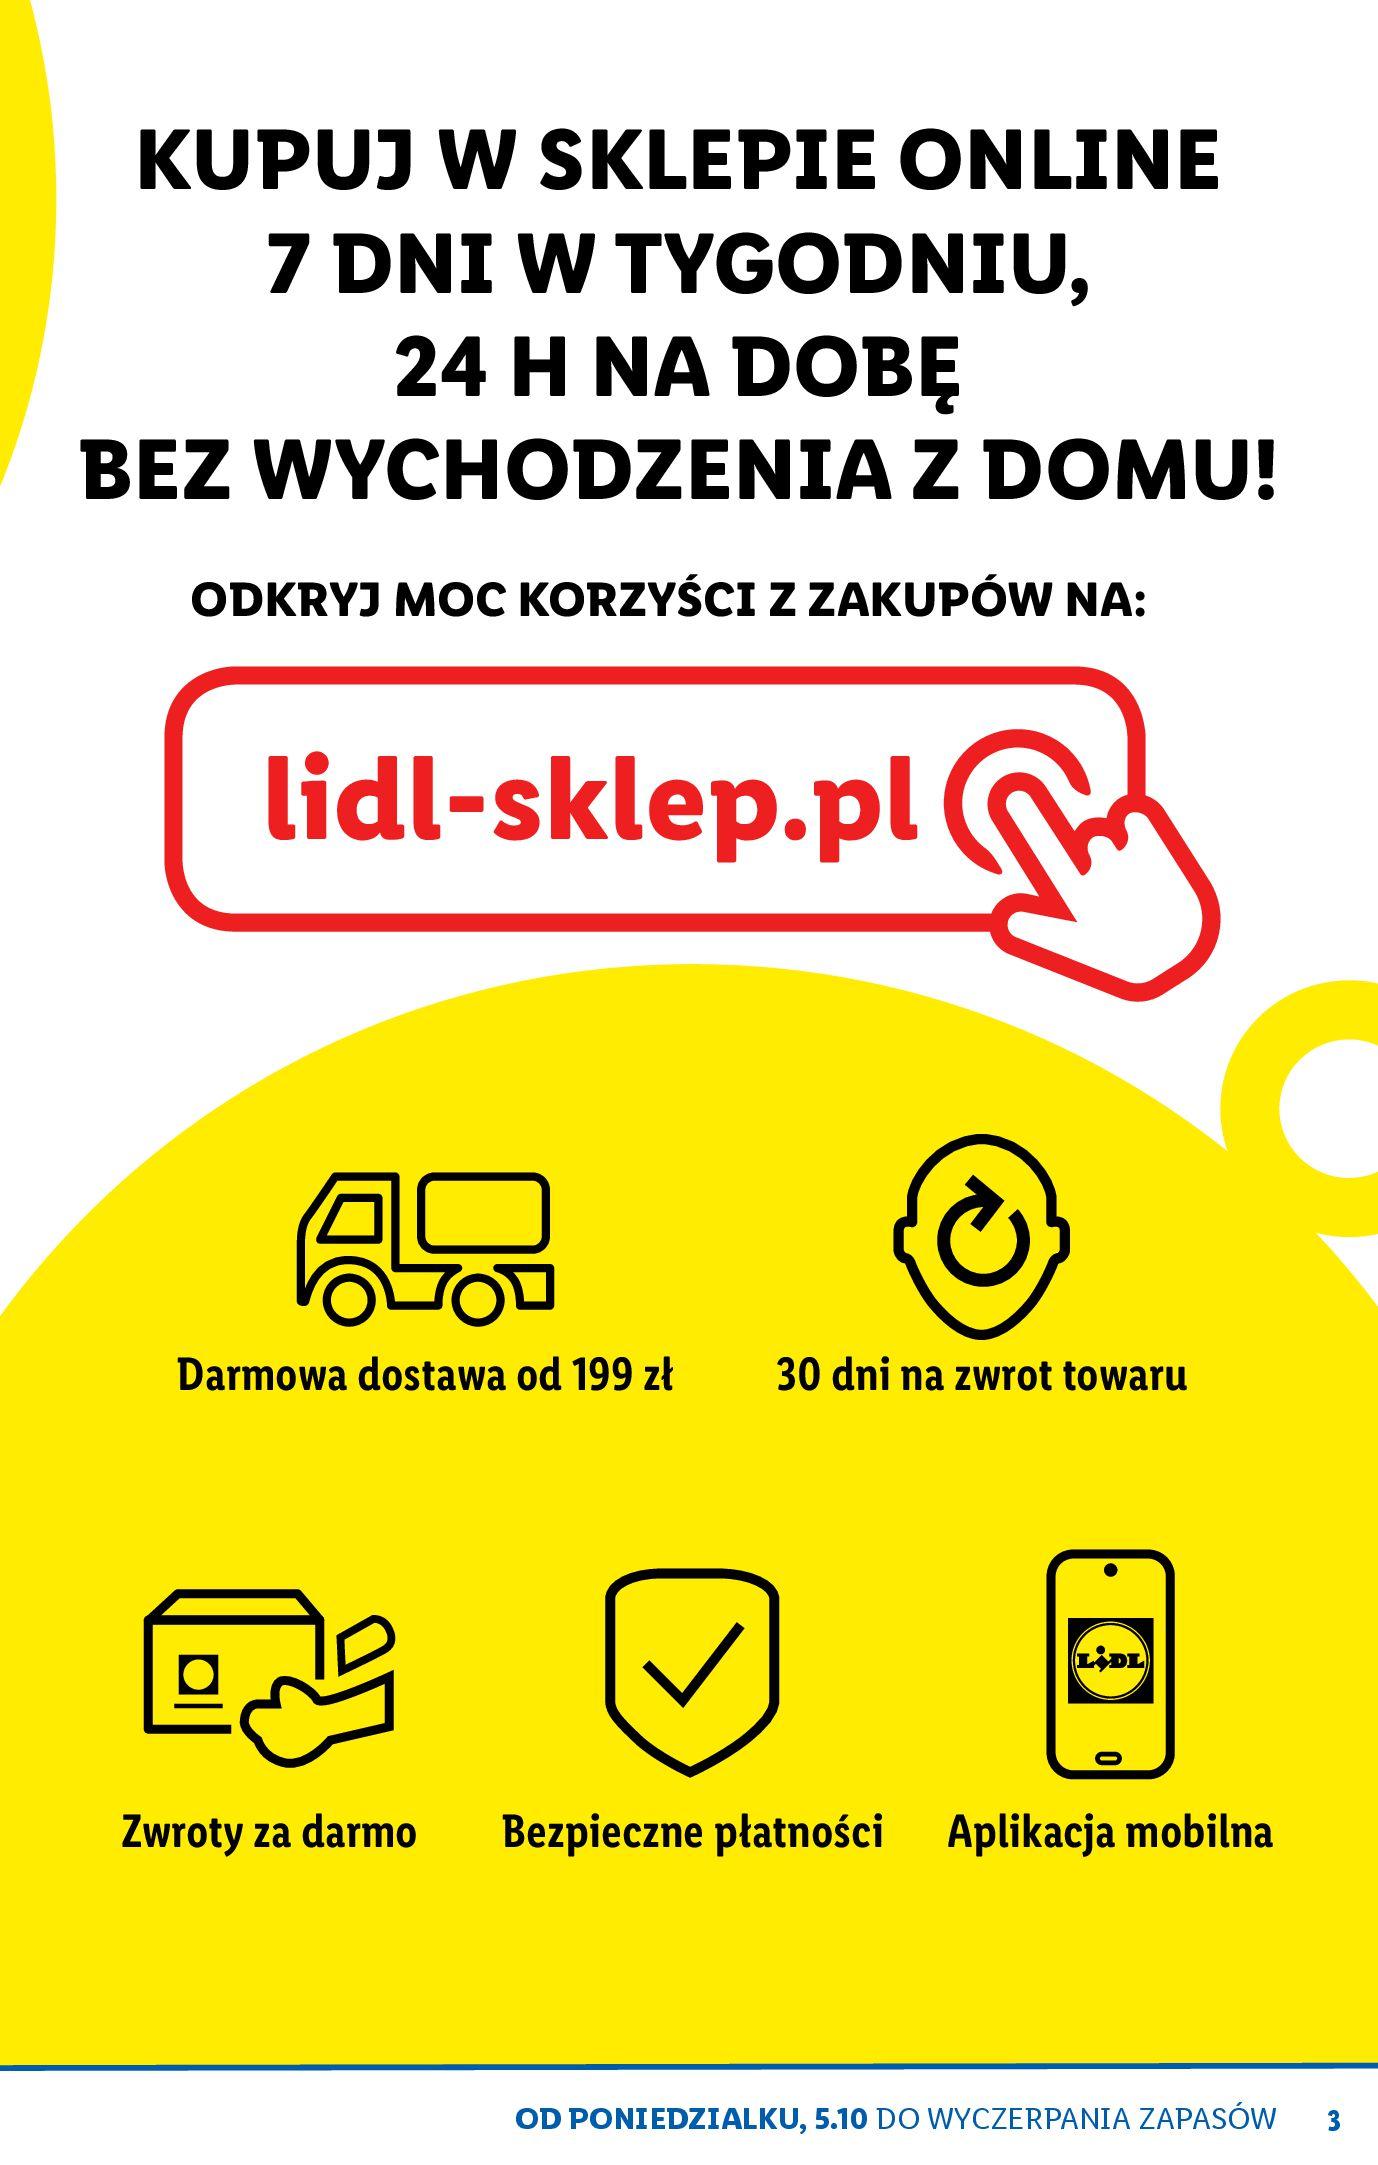 Gazetka Lidl - Katalog sklepu ONLINE-04.10.2020-31.10.2020-page-3